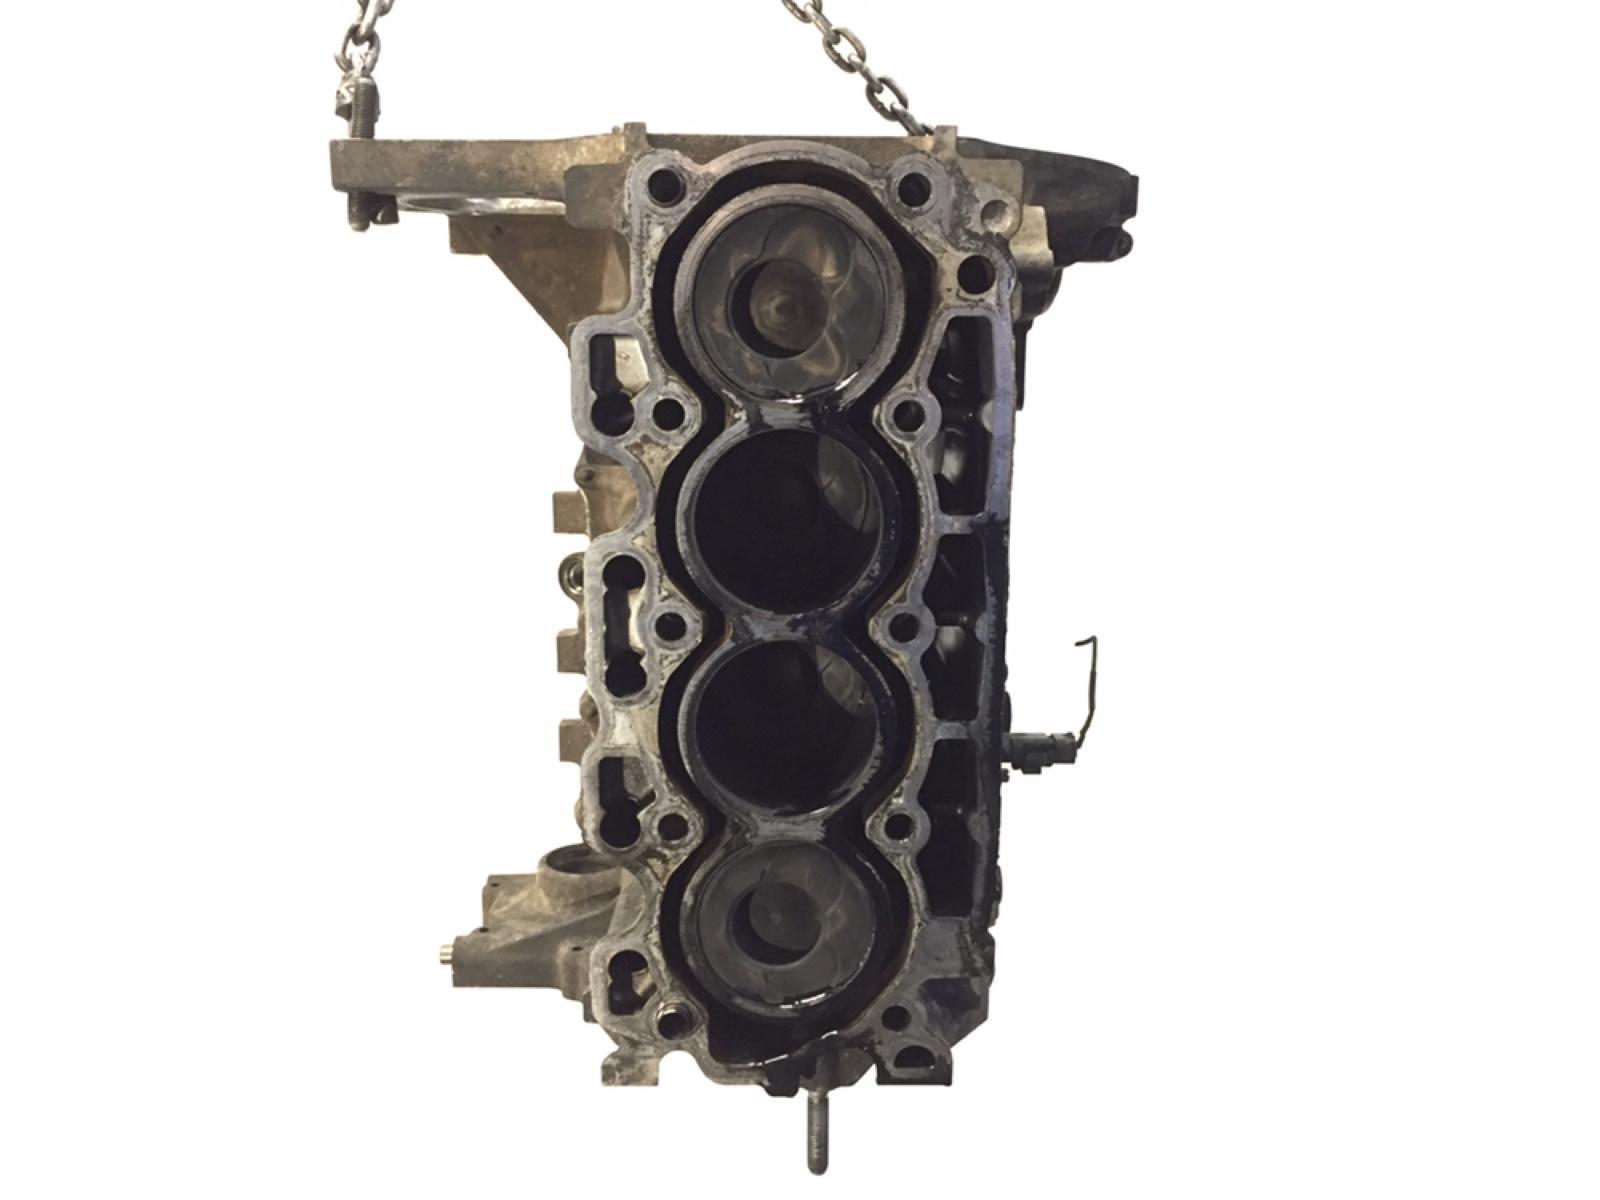 Блок цилиндров Peugeot 206 1.4 HDI 2003 (б/у)